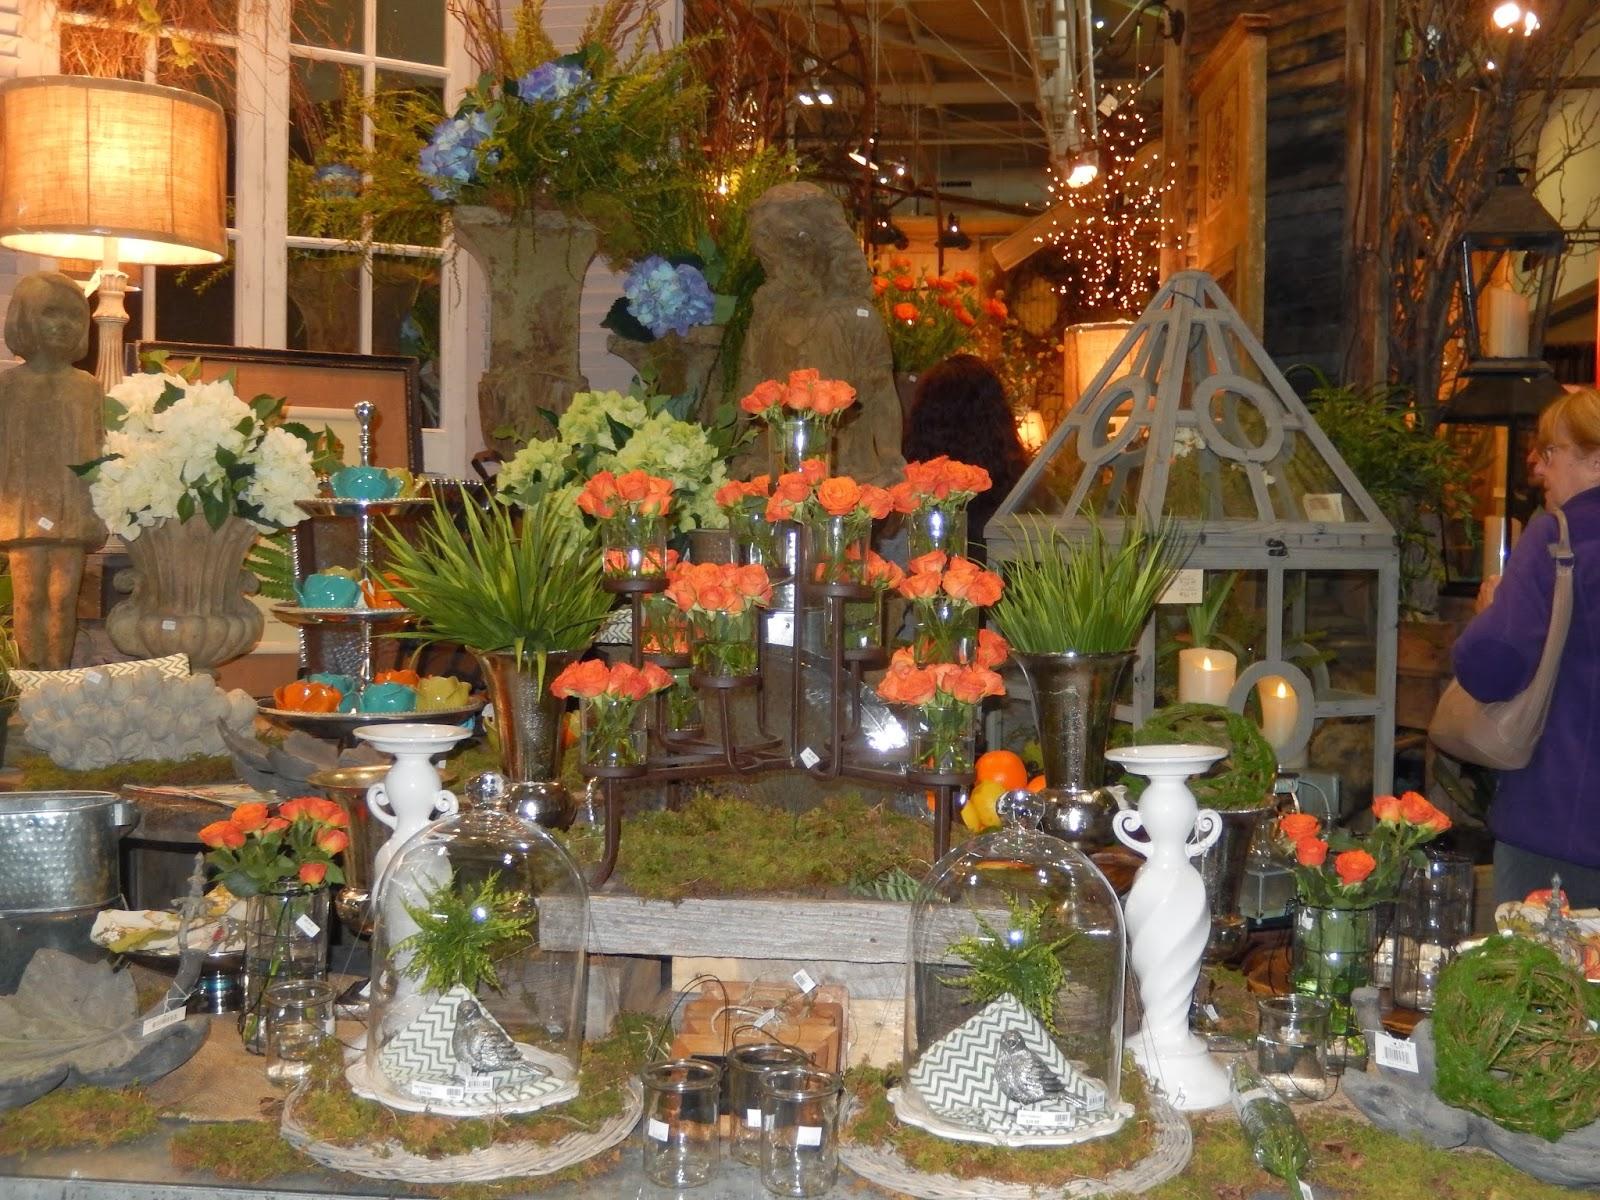 The french tangerine nashville part 2 Nashville home and garden show